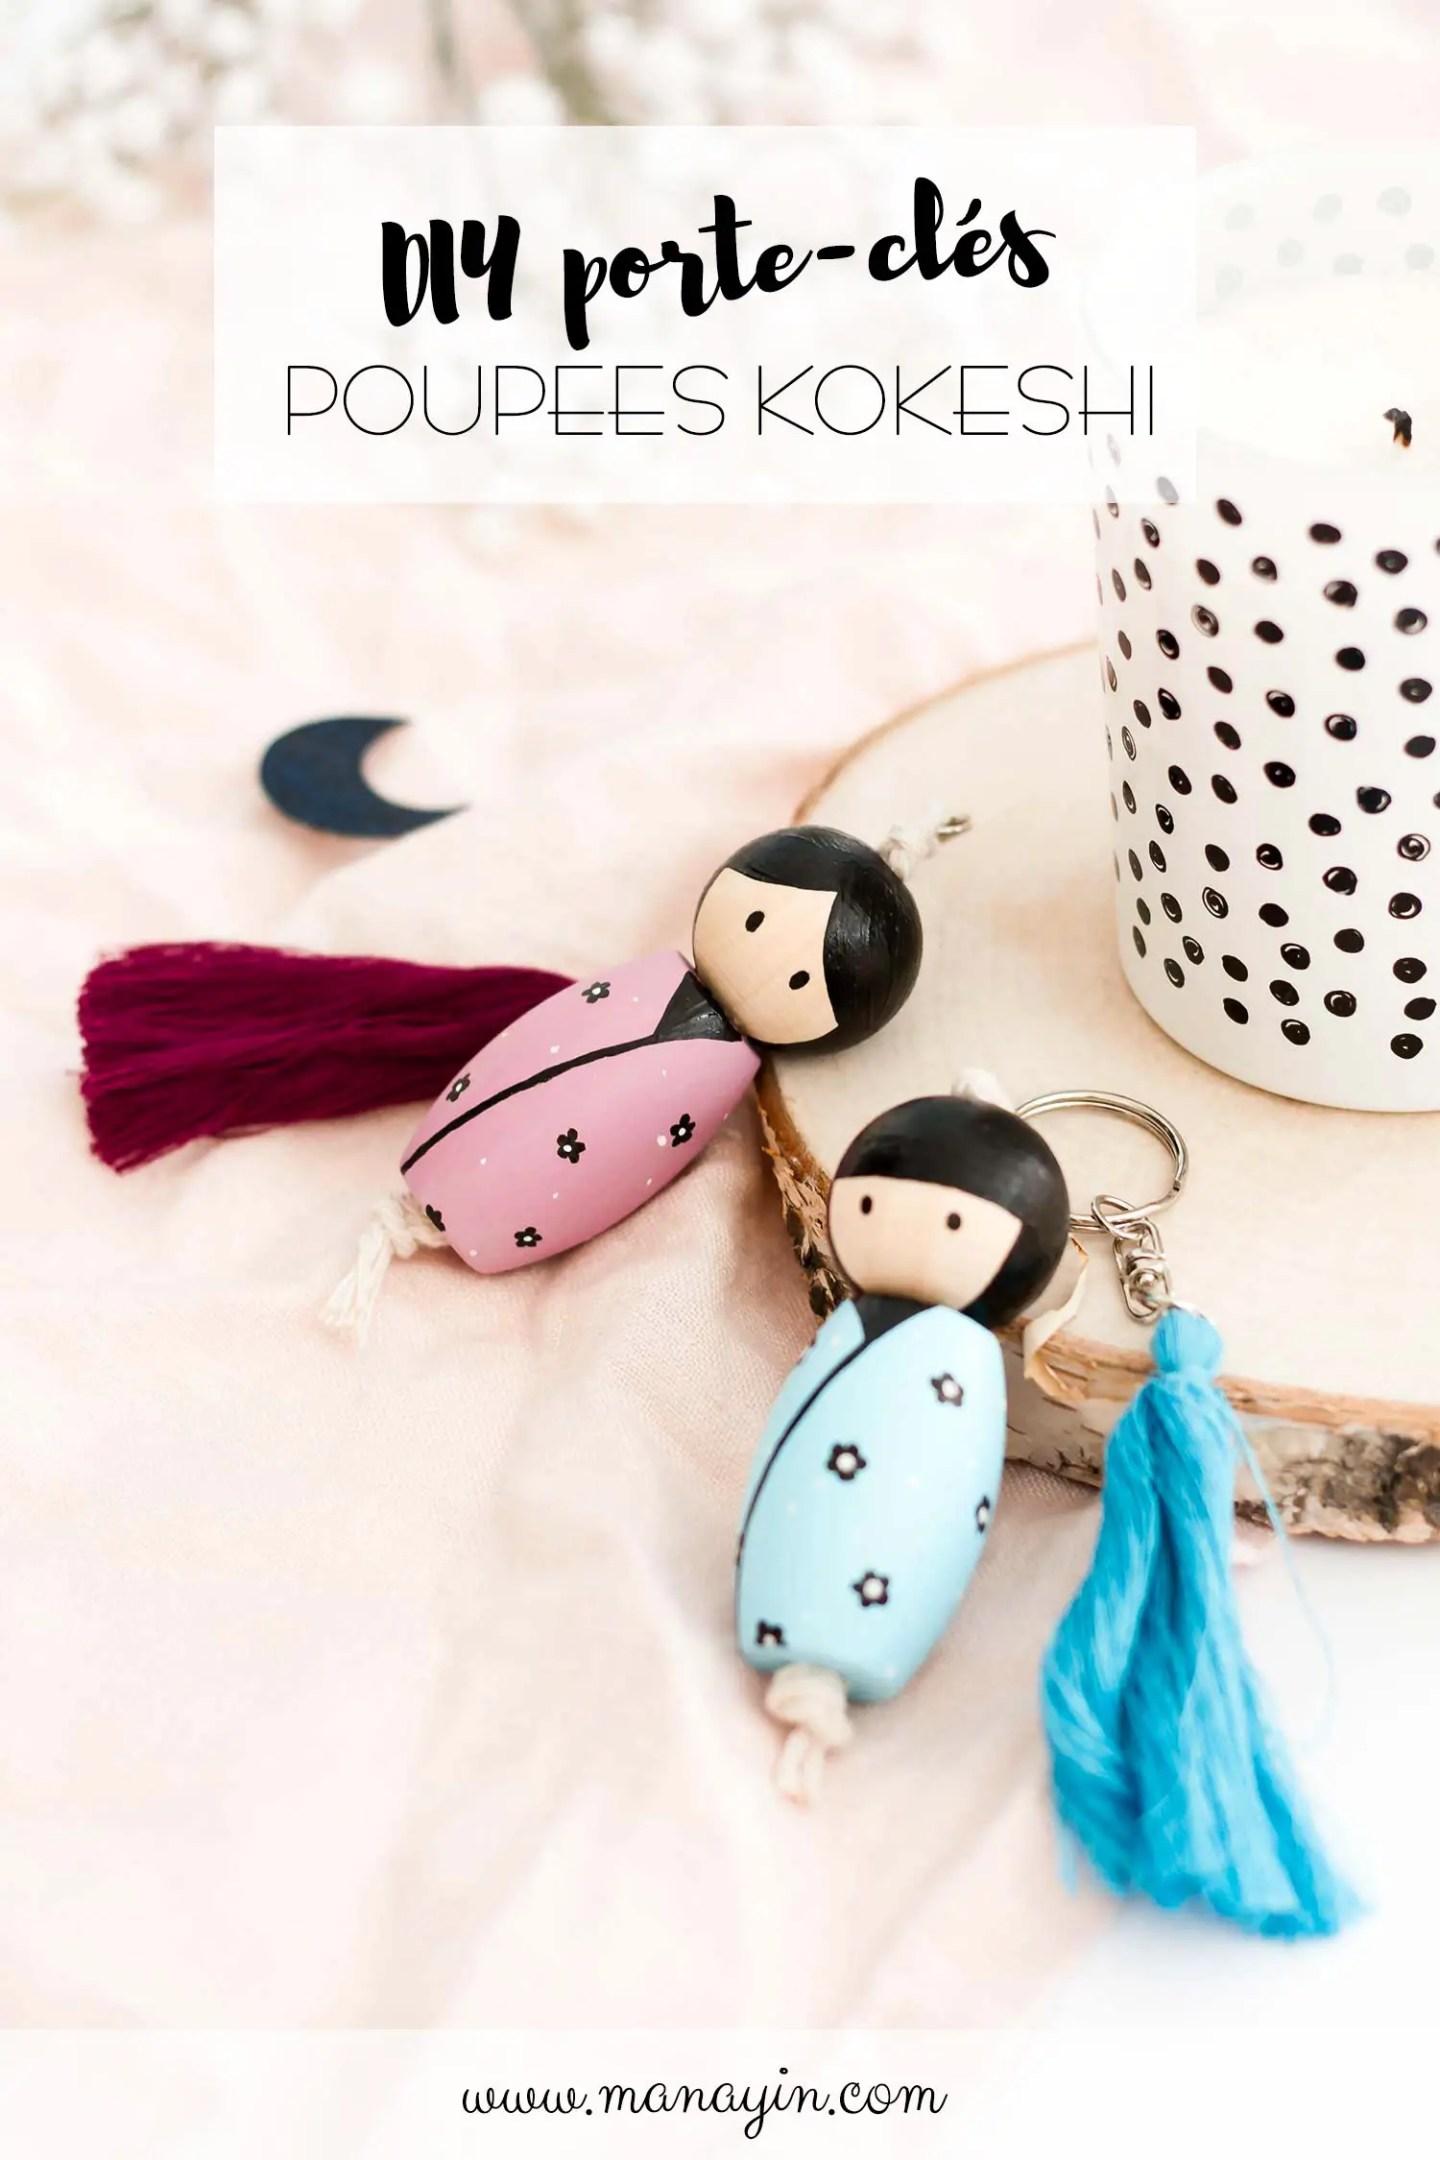 DIY poupée kokeshi